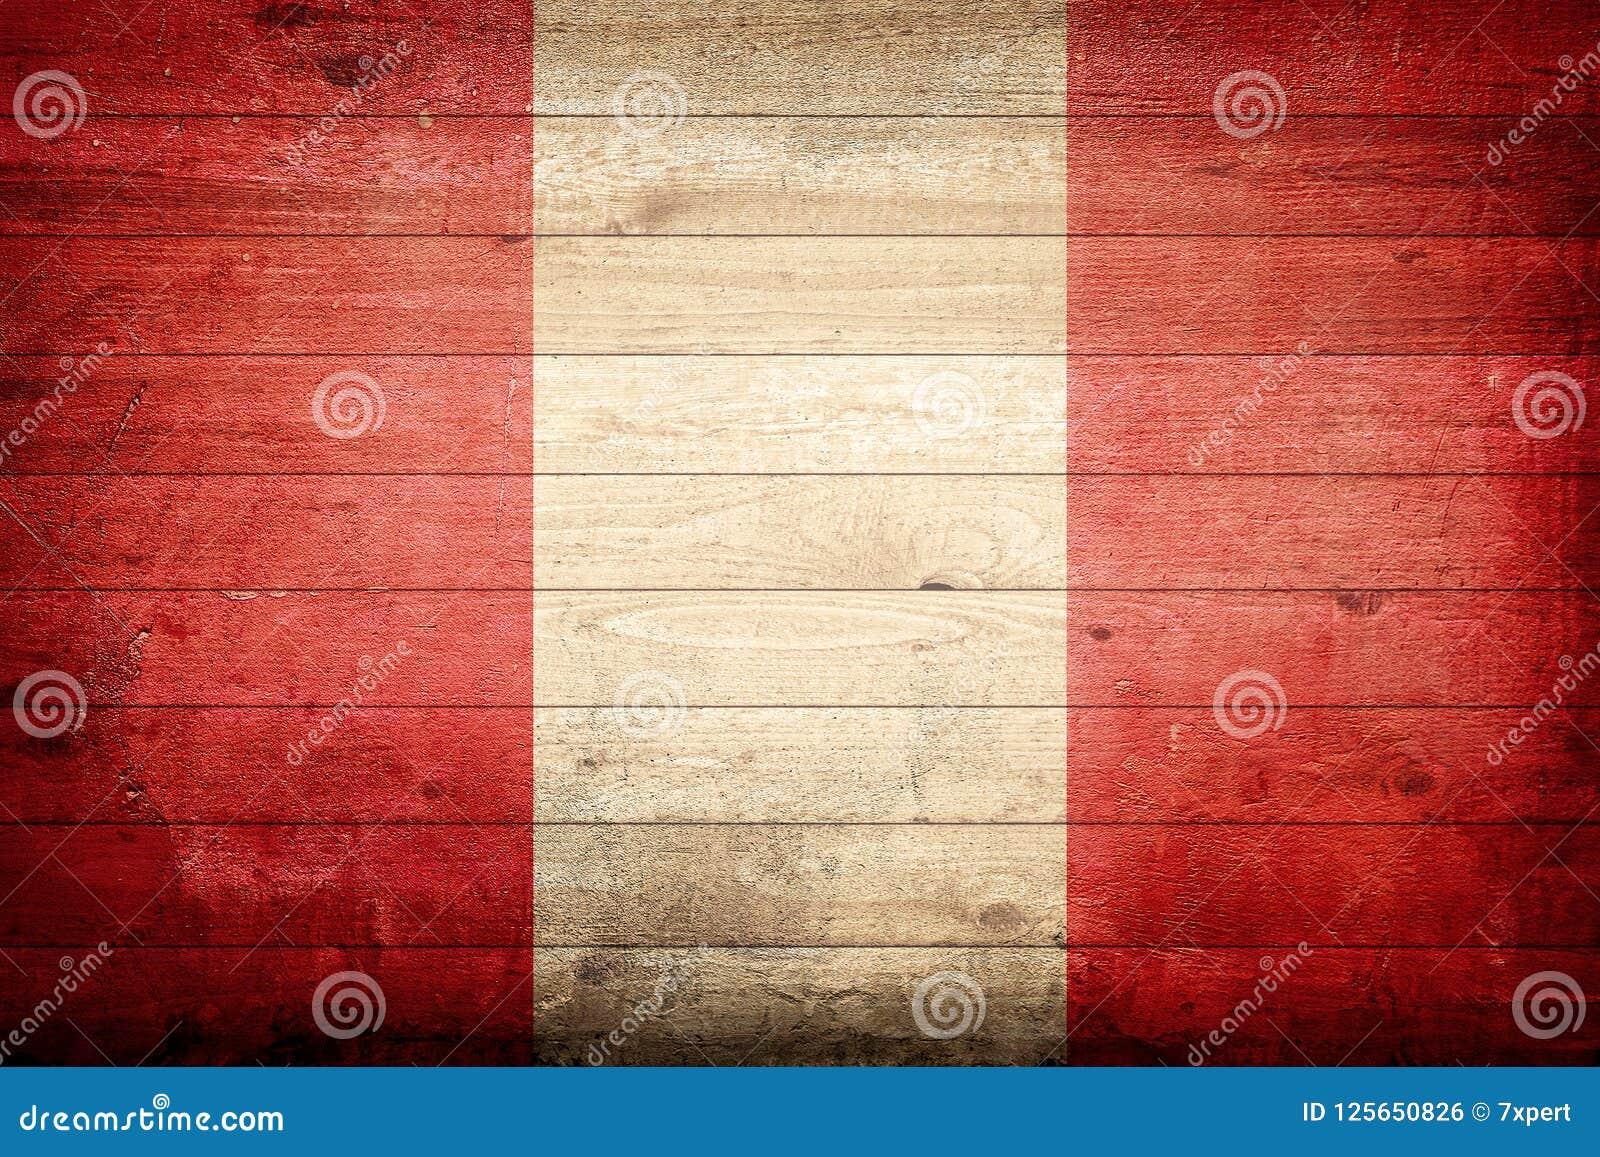 Peru National Flag Stock Photo Image Of Luxury Wallpaper 125650826